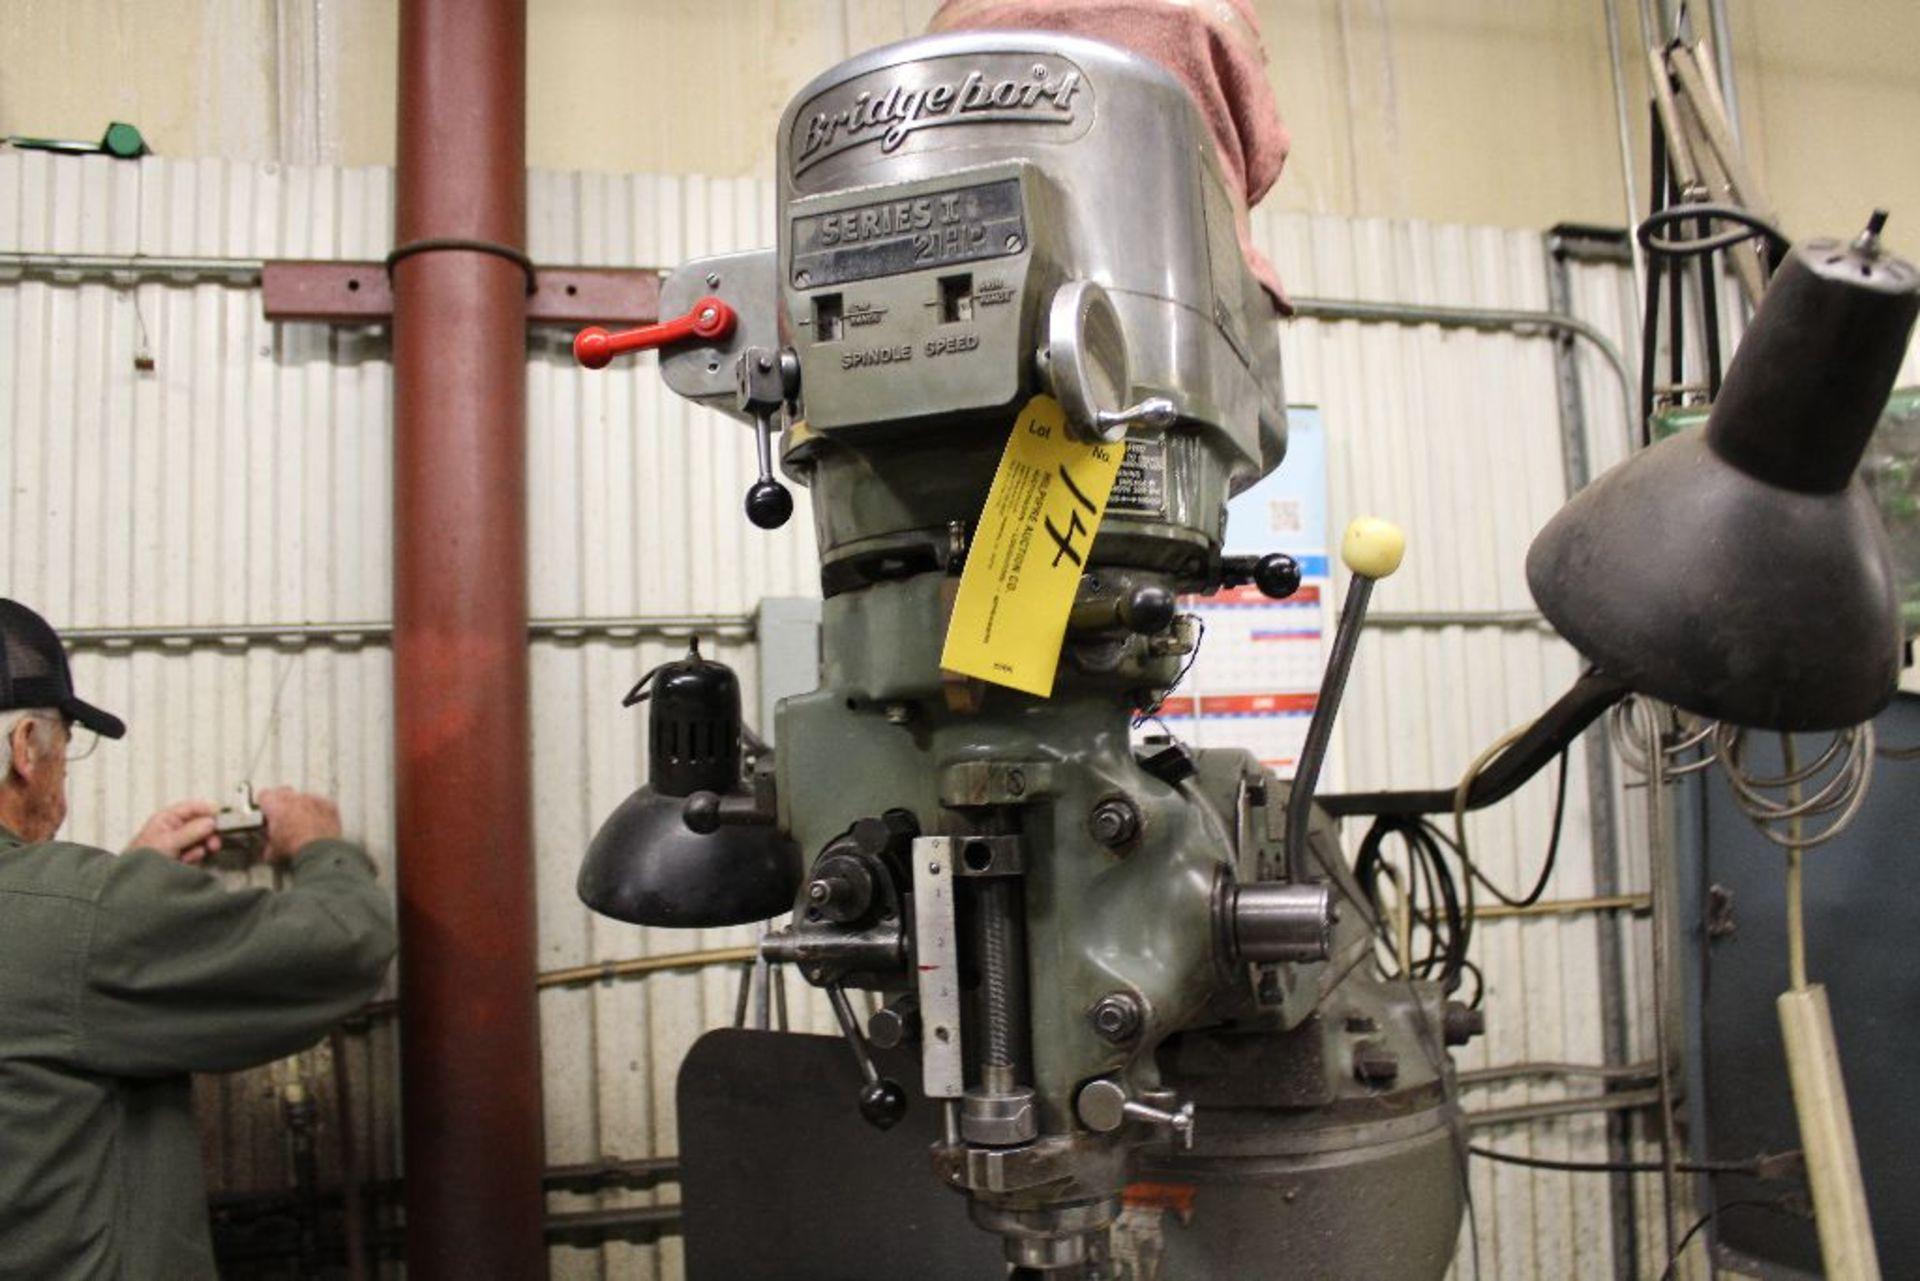 Lot 014 - Bridgeport vertical mill Series II, model 12-BR, sn 245144, 2 hp, poer feed, DRO Pros, 2m digital